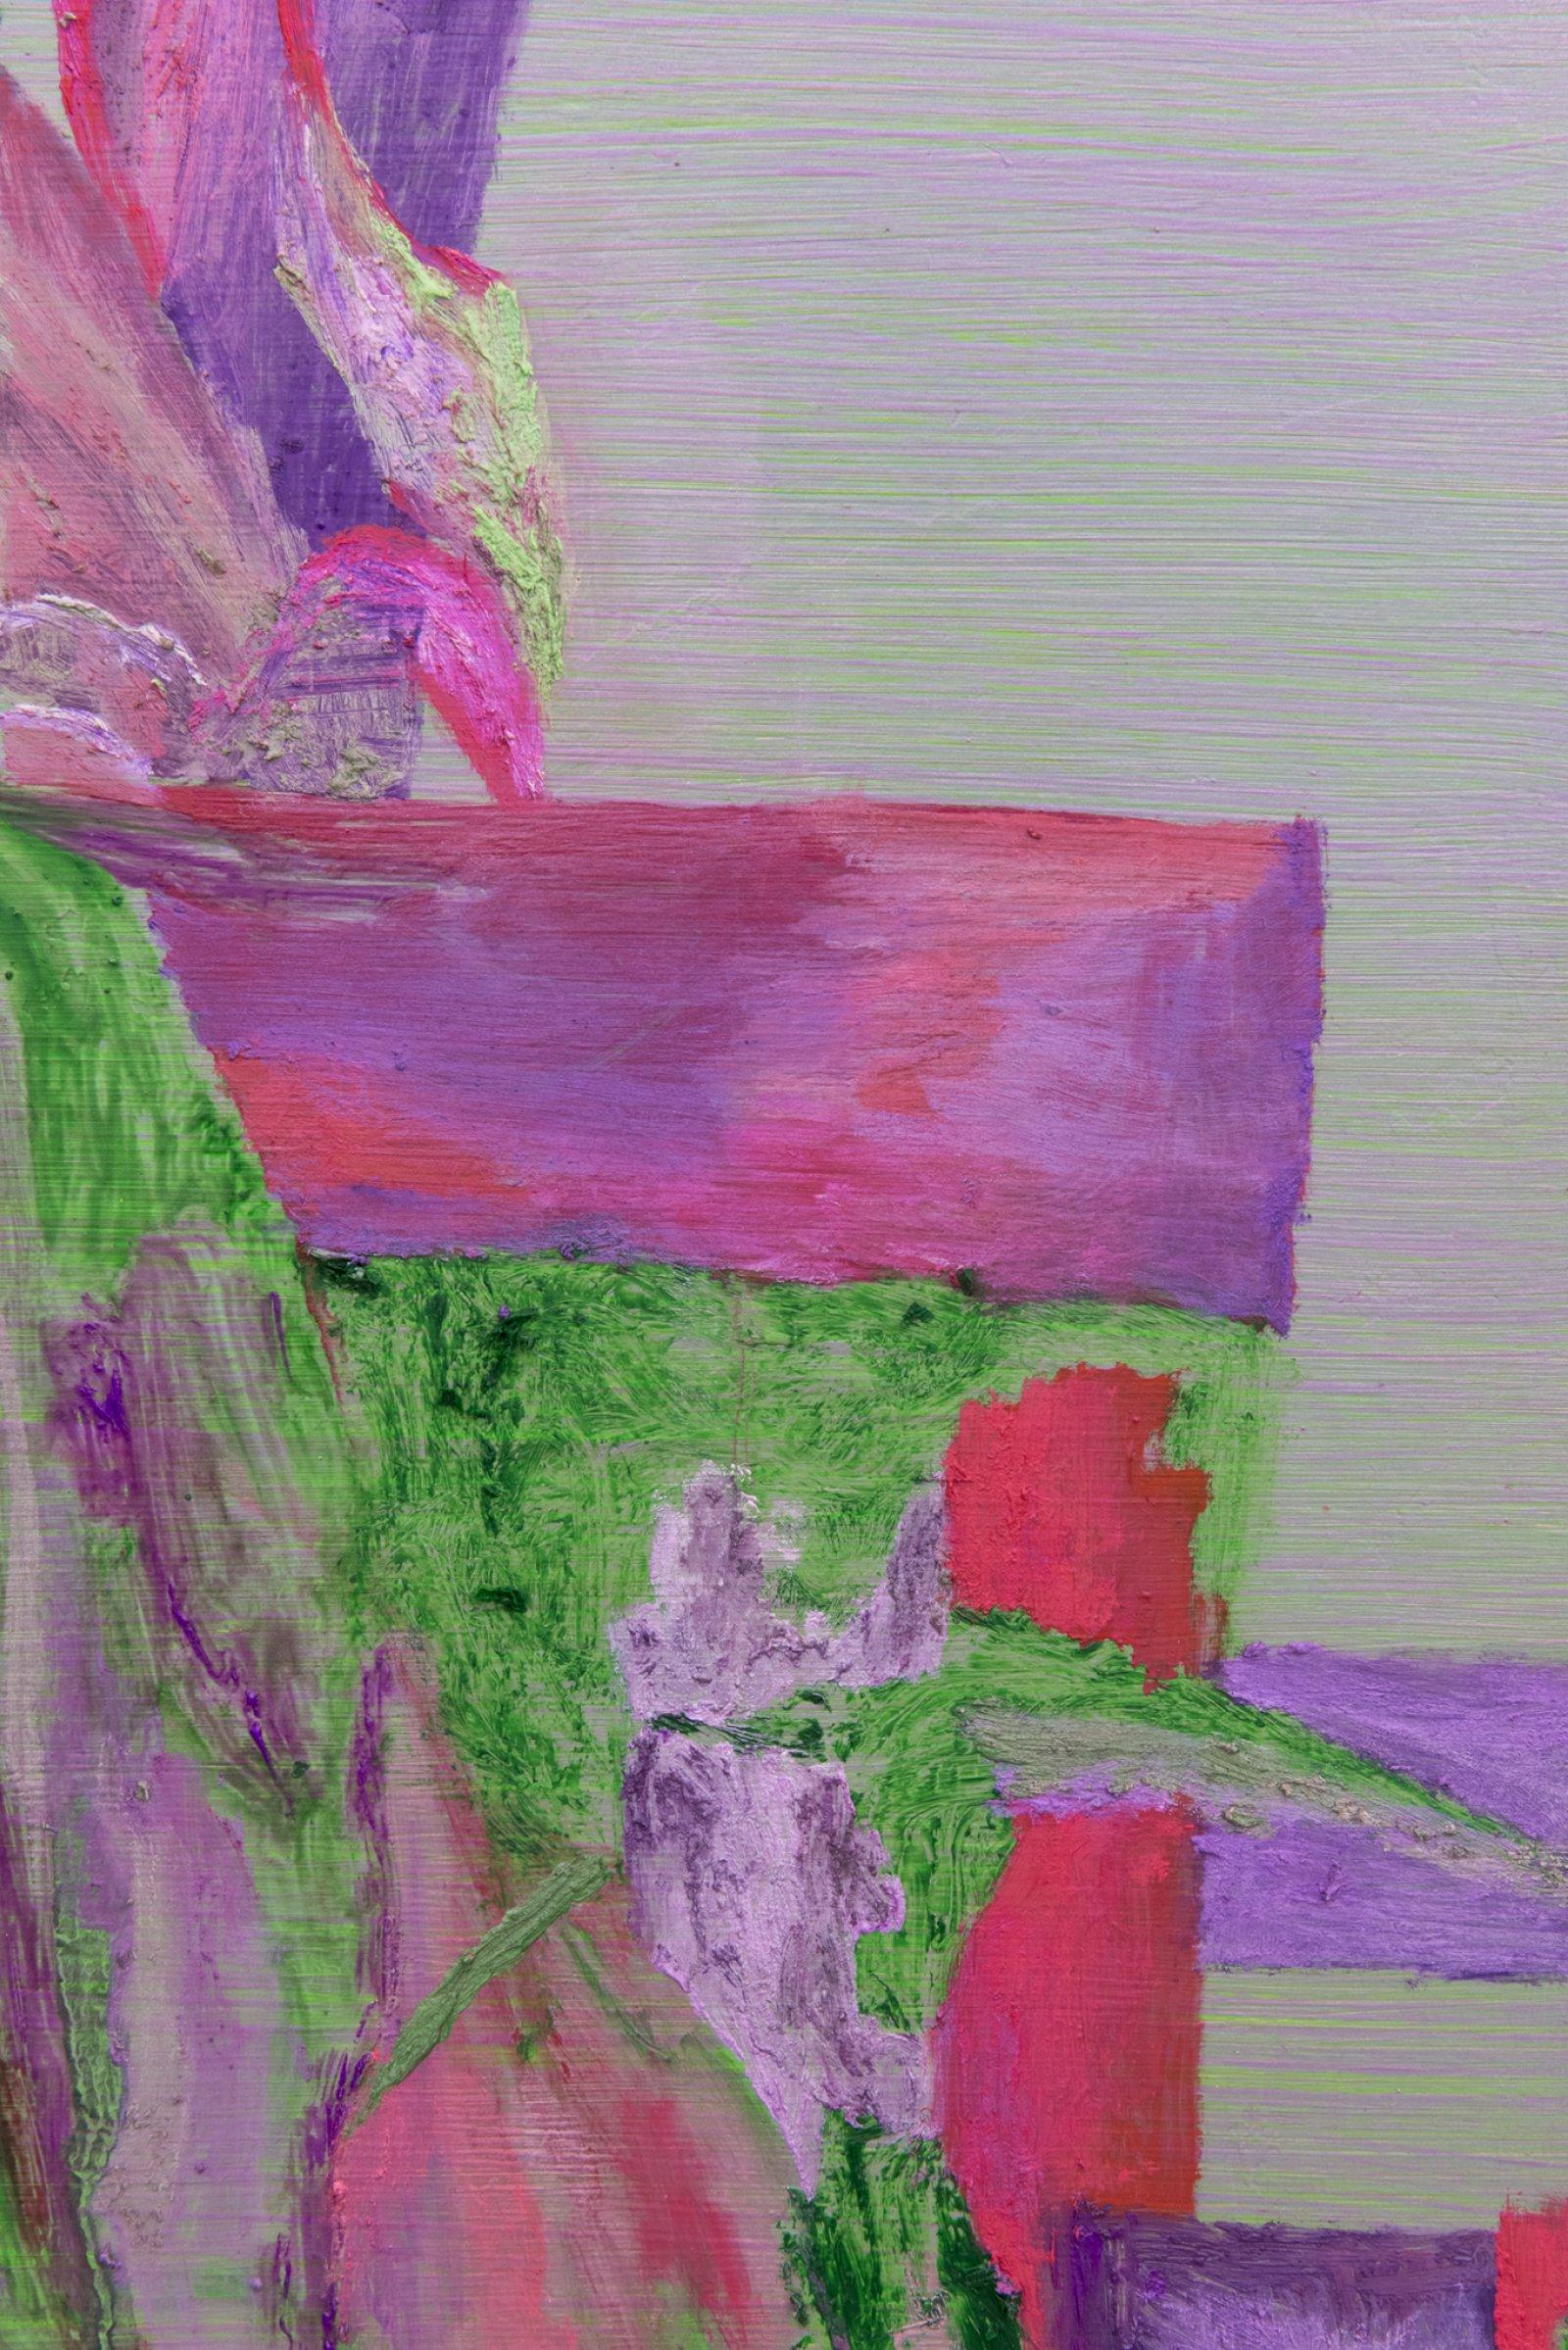 Rebecca Brewer,Flower Dumpster(detail), 2018, oil on panel, 42 x 36 in. (107 x 92 cm)